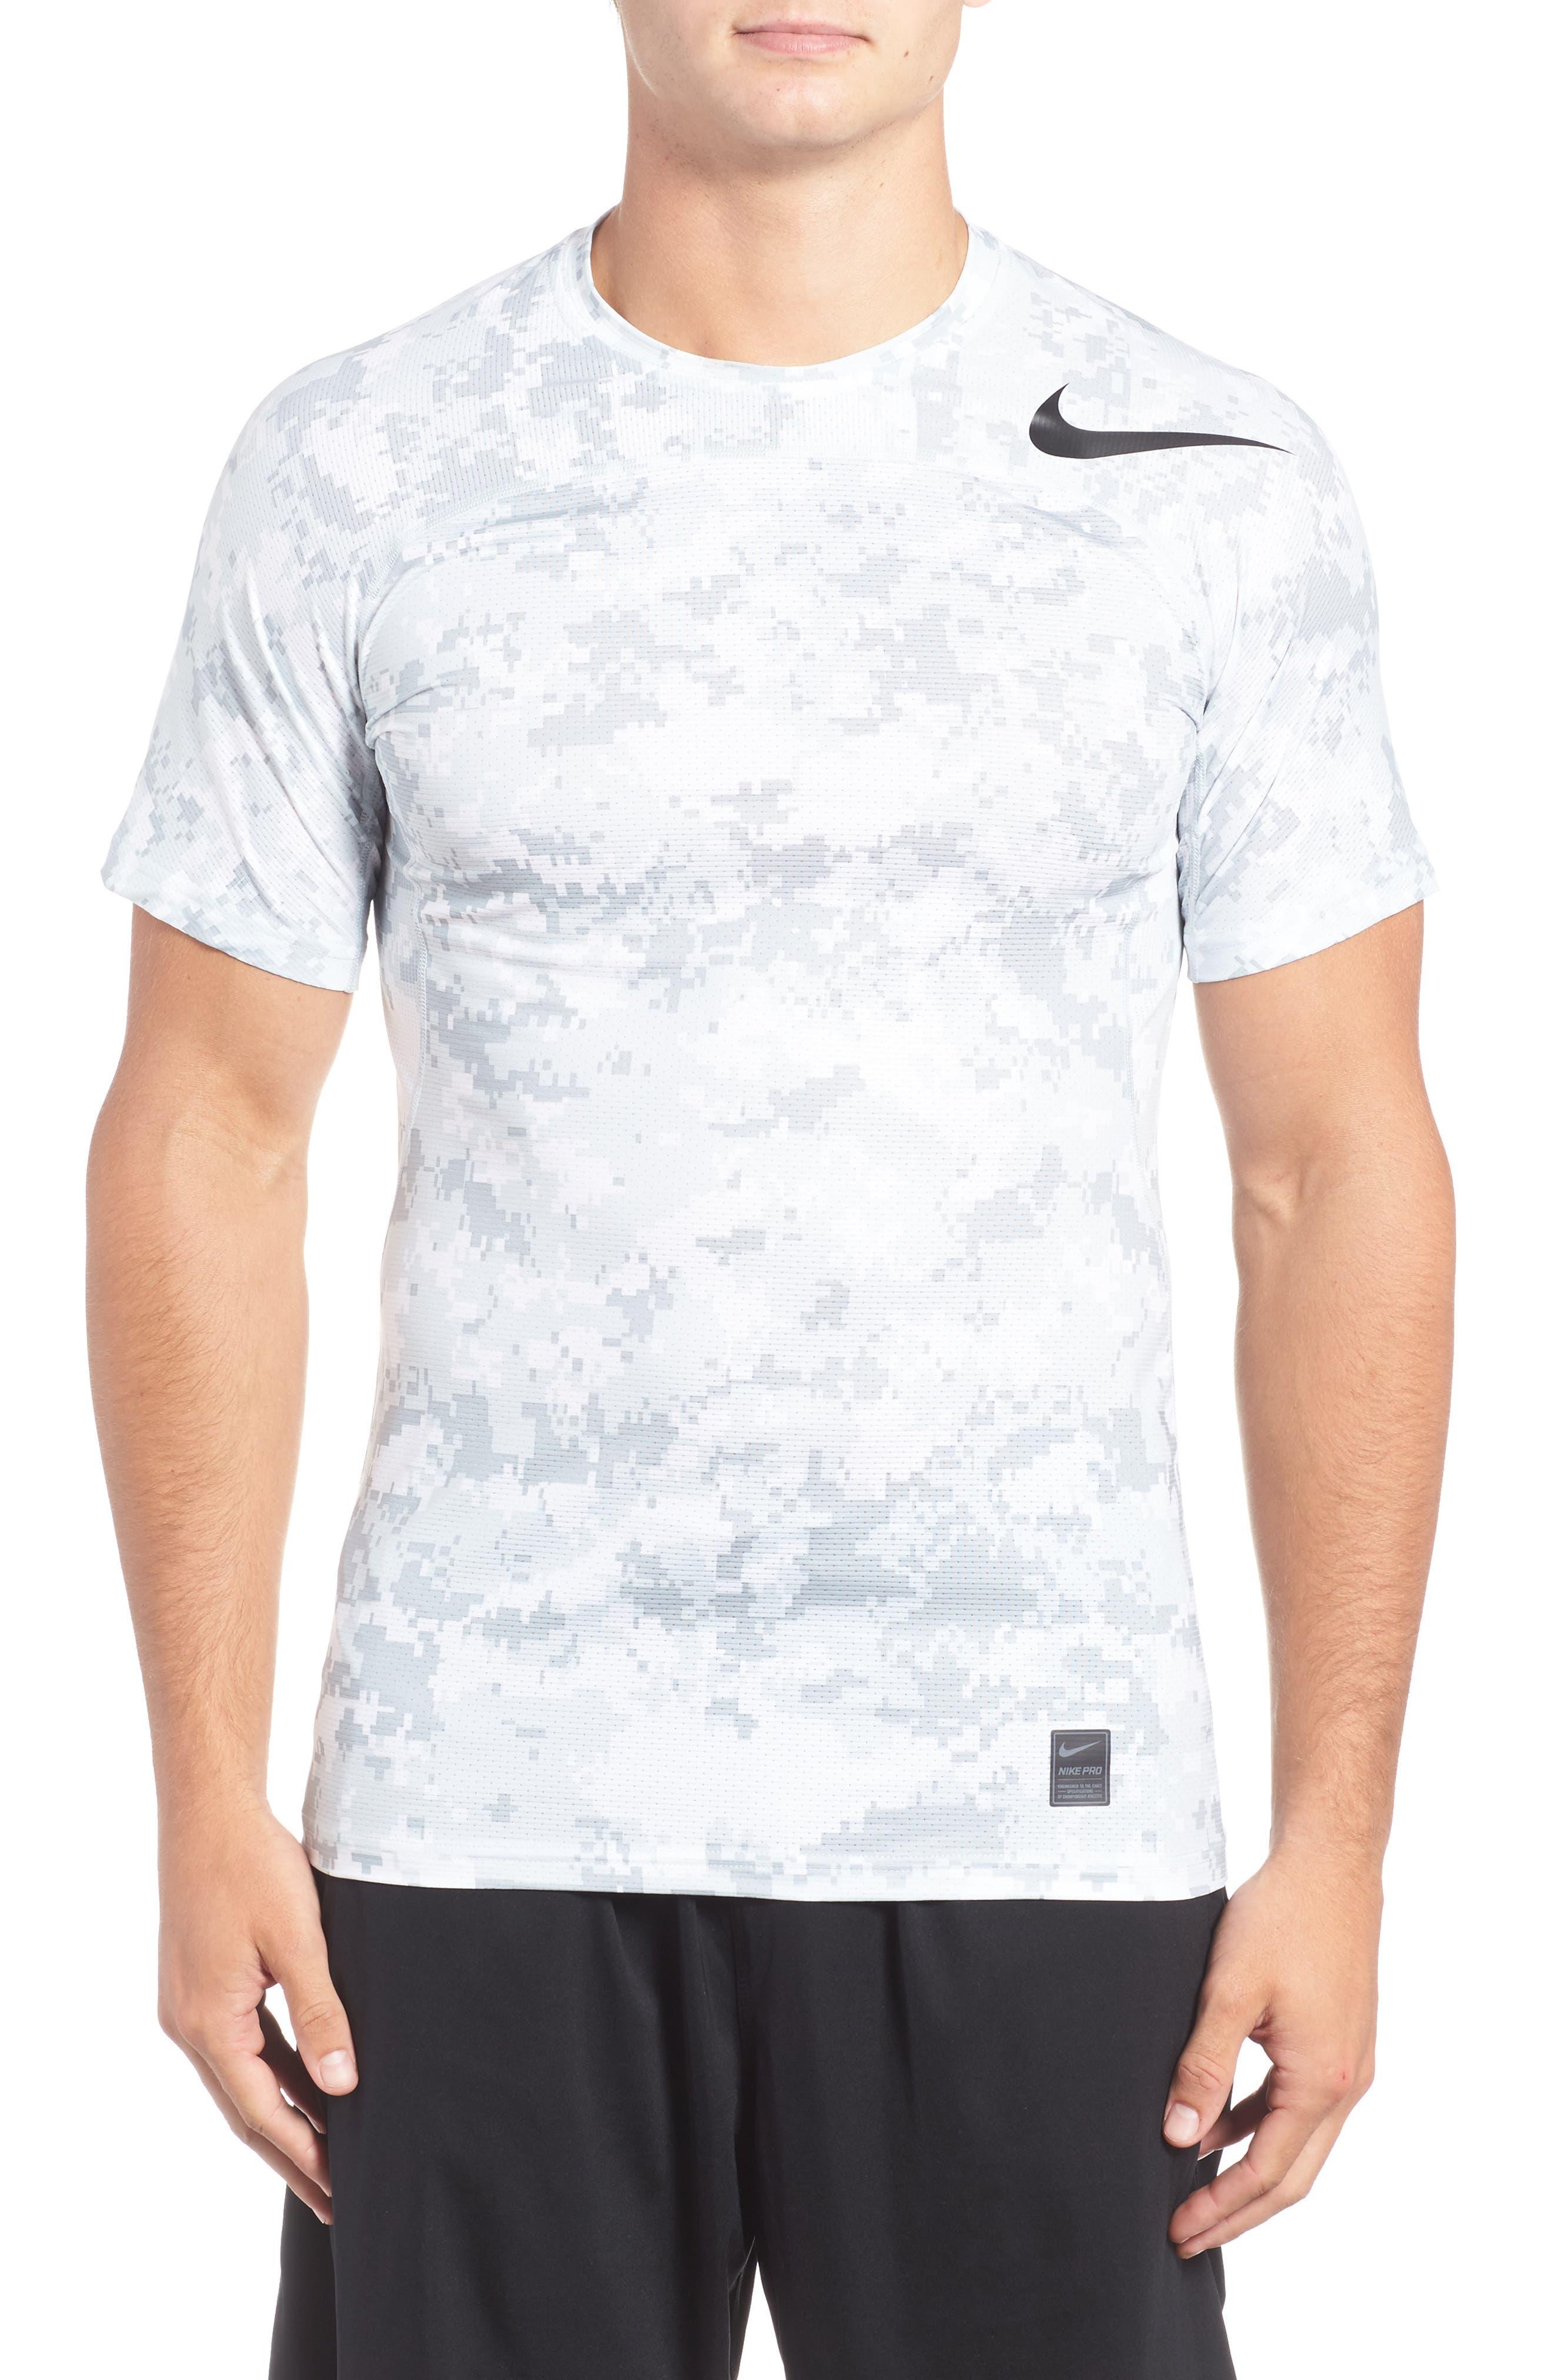 Pro Hypercool Seamless T-Shirt,                             Main thumbnail 1, color,                             100